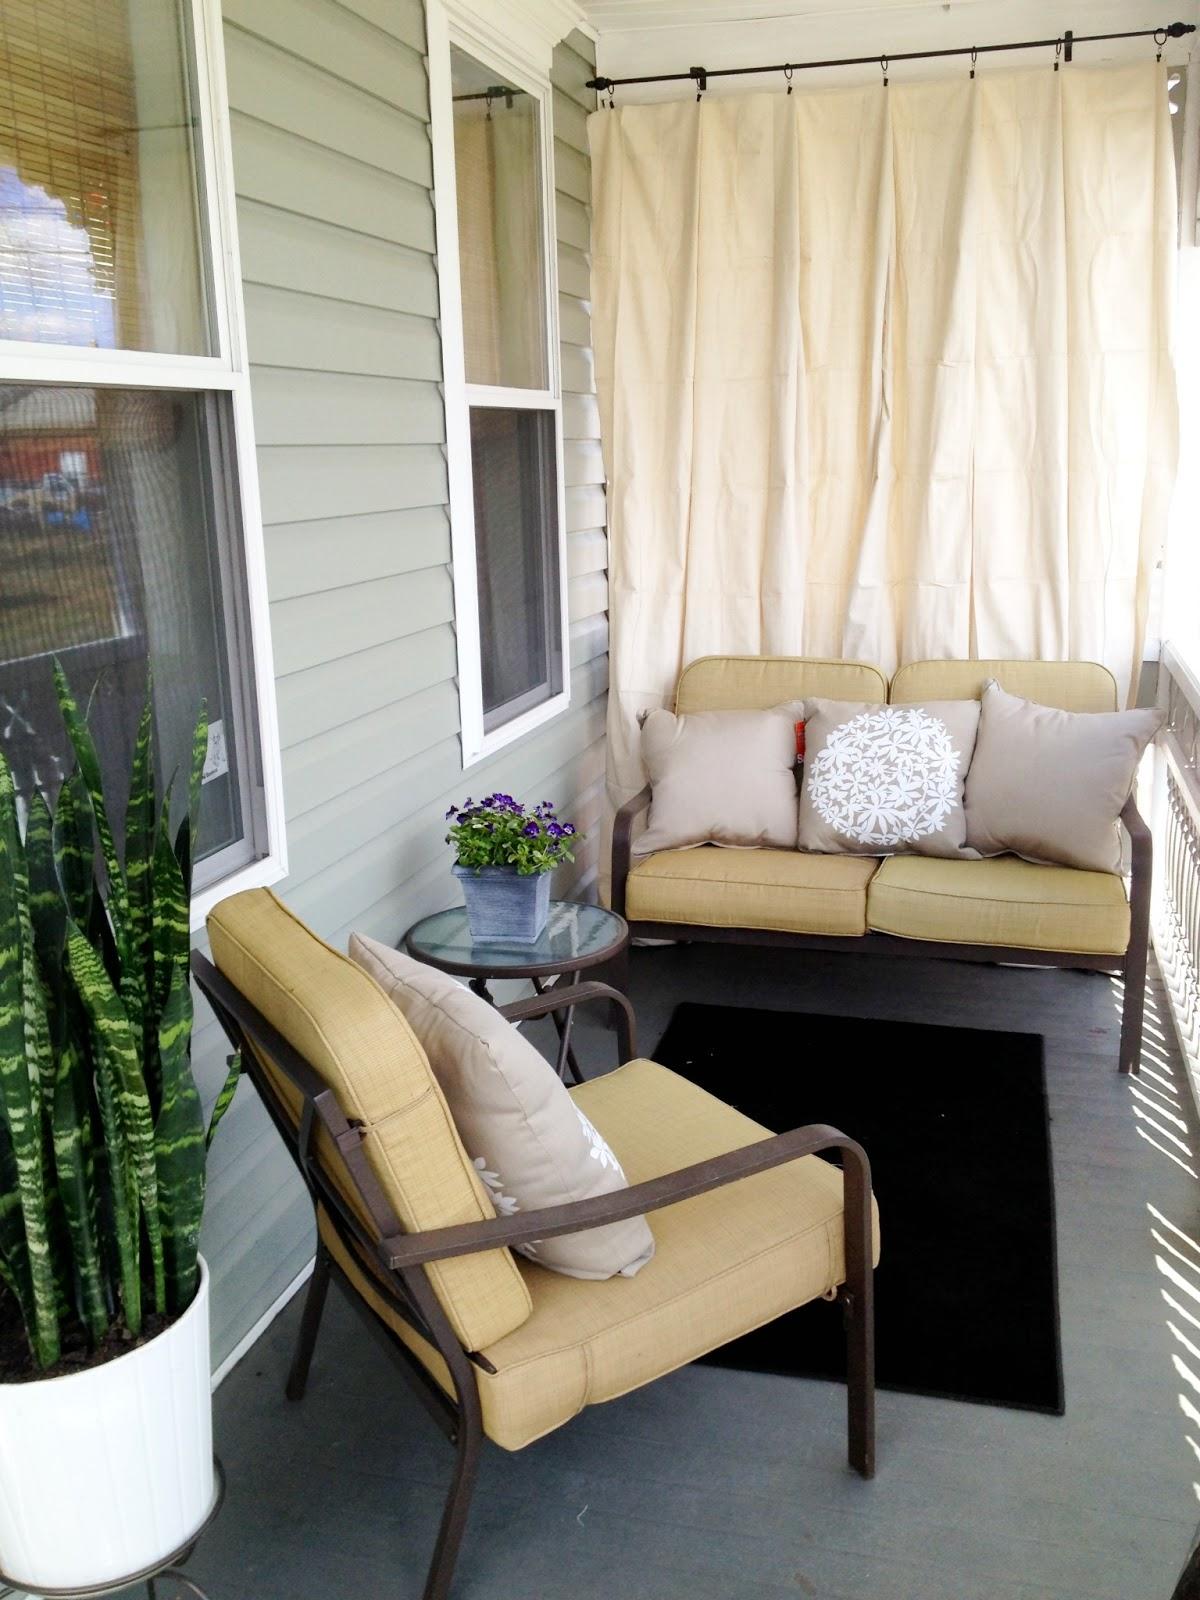 DIY Outdoor Curtain